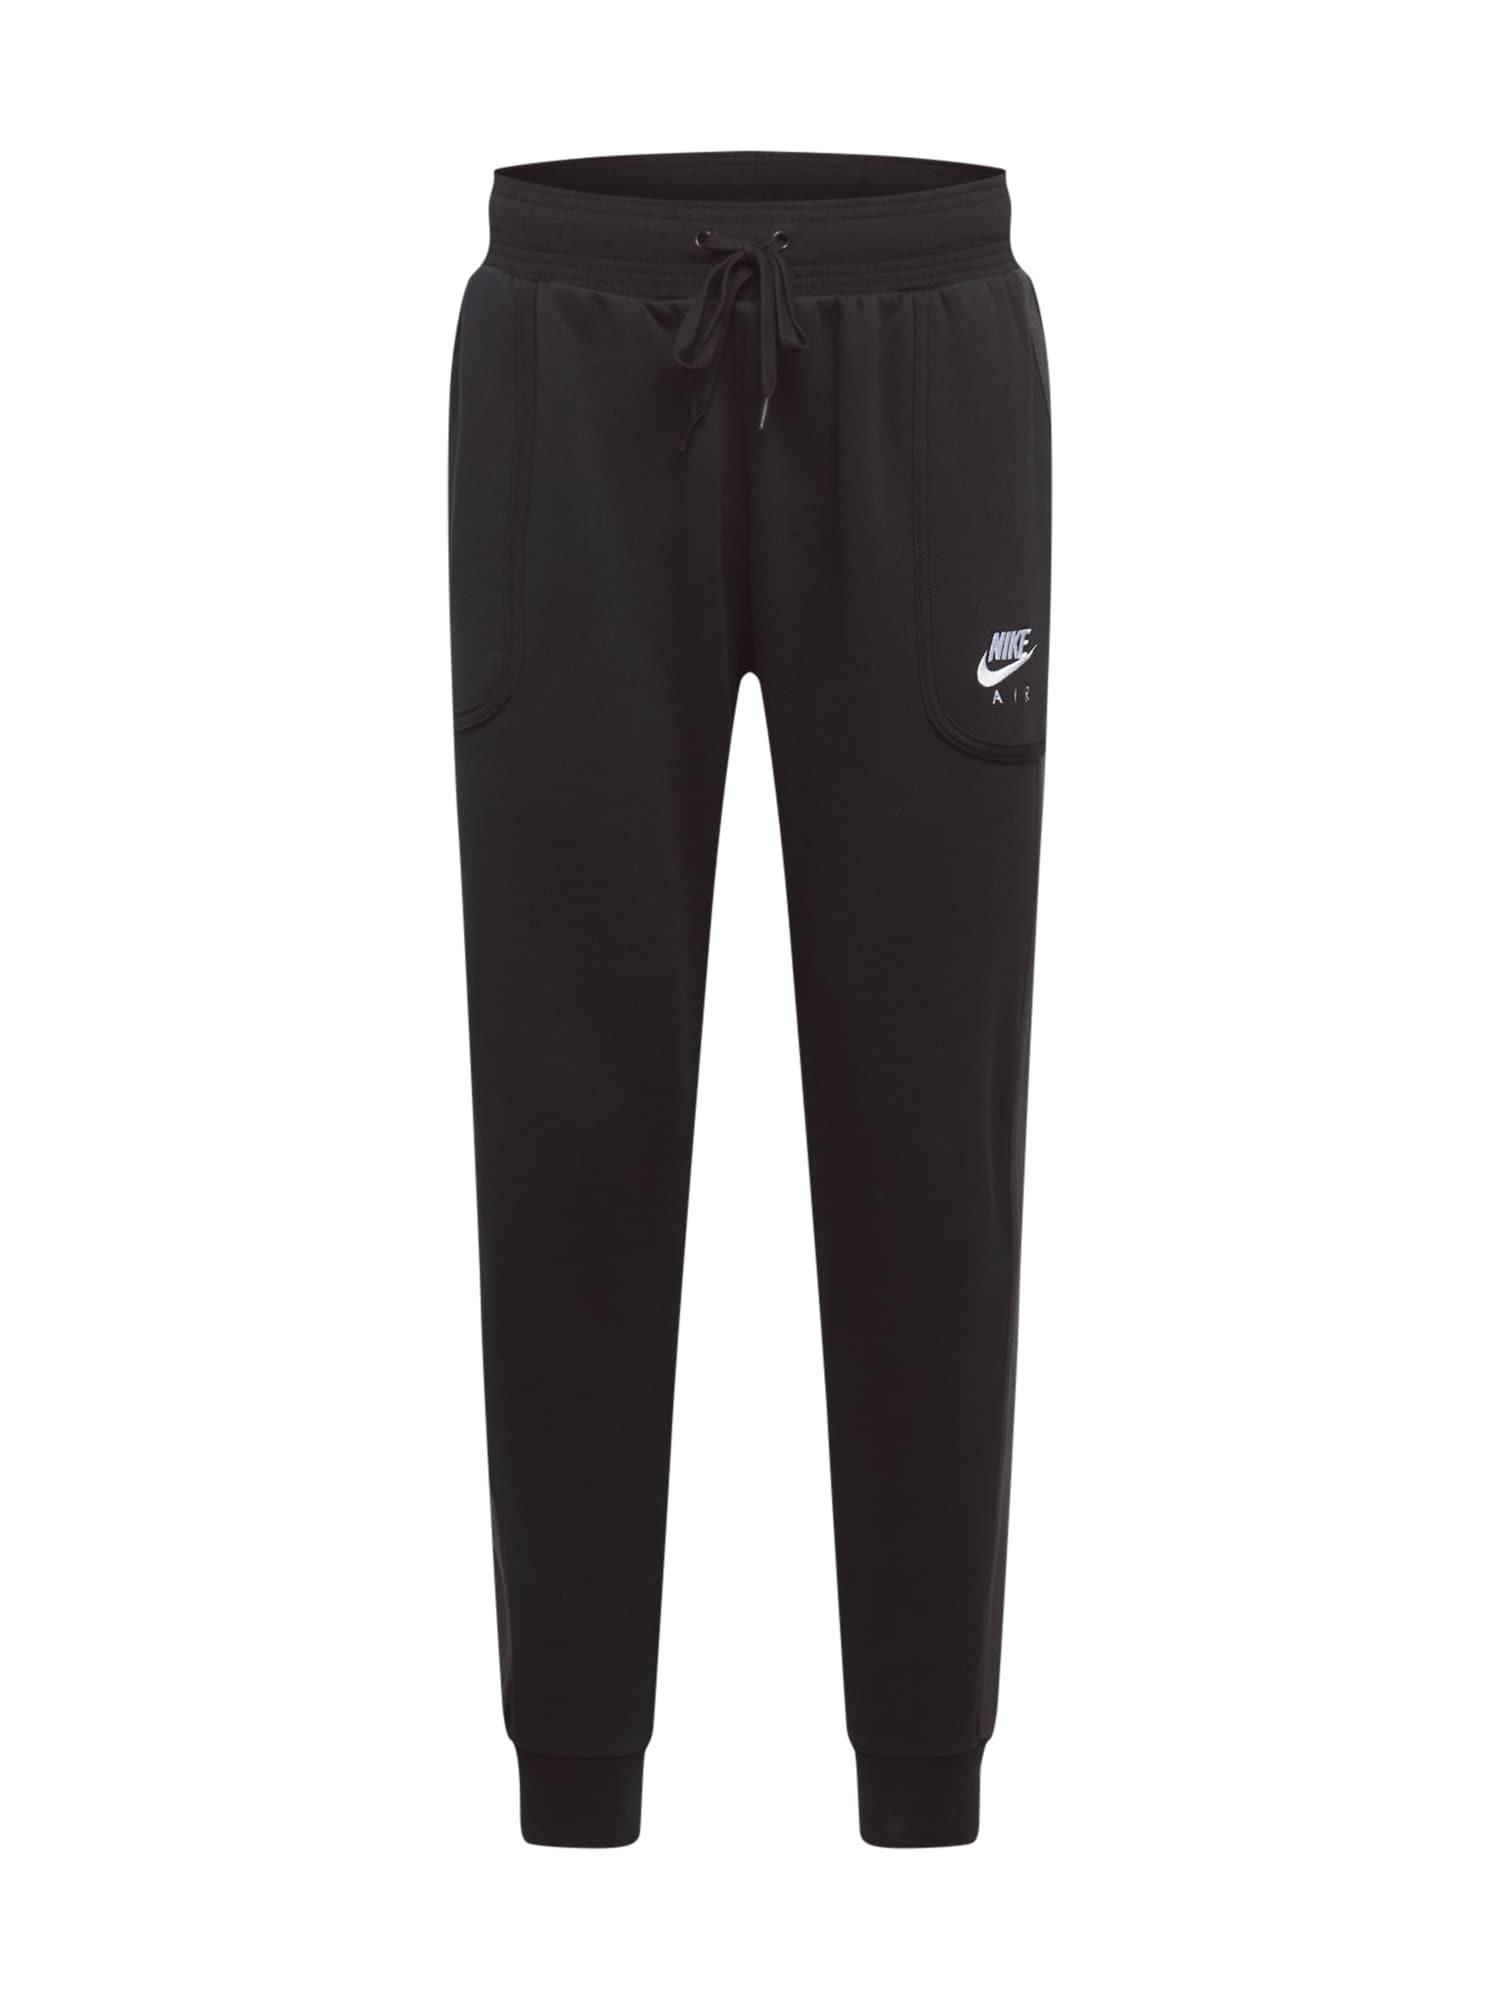 Nike Sportswear Kelnės juoda / balta / tamsiai pilka